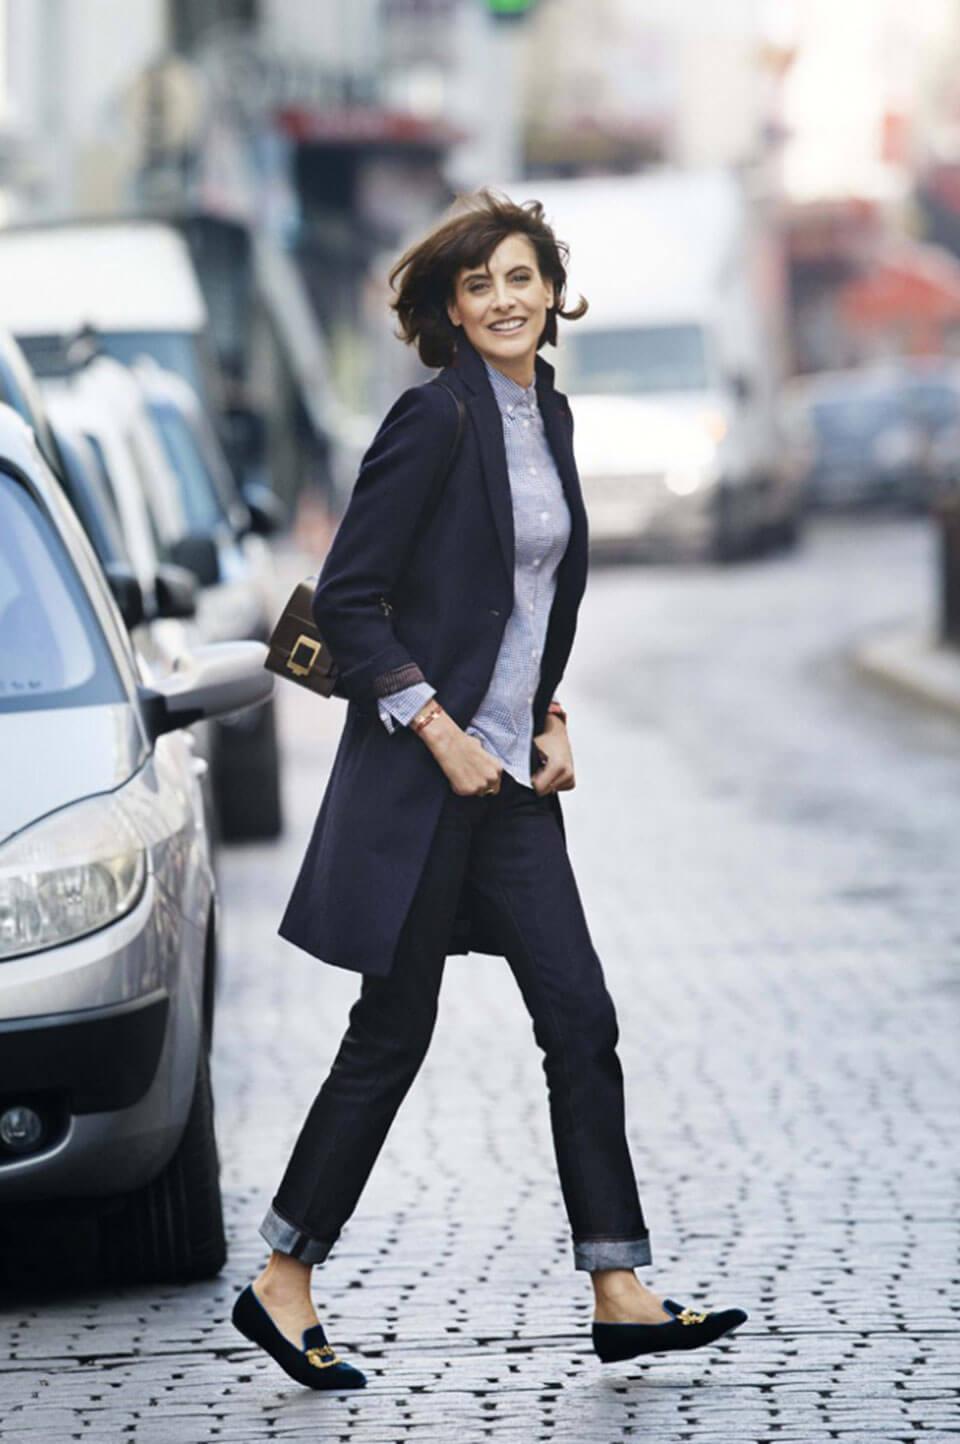 Ines de la Fressange - French style